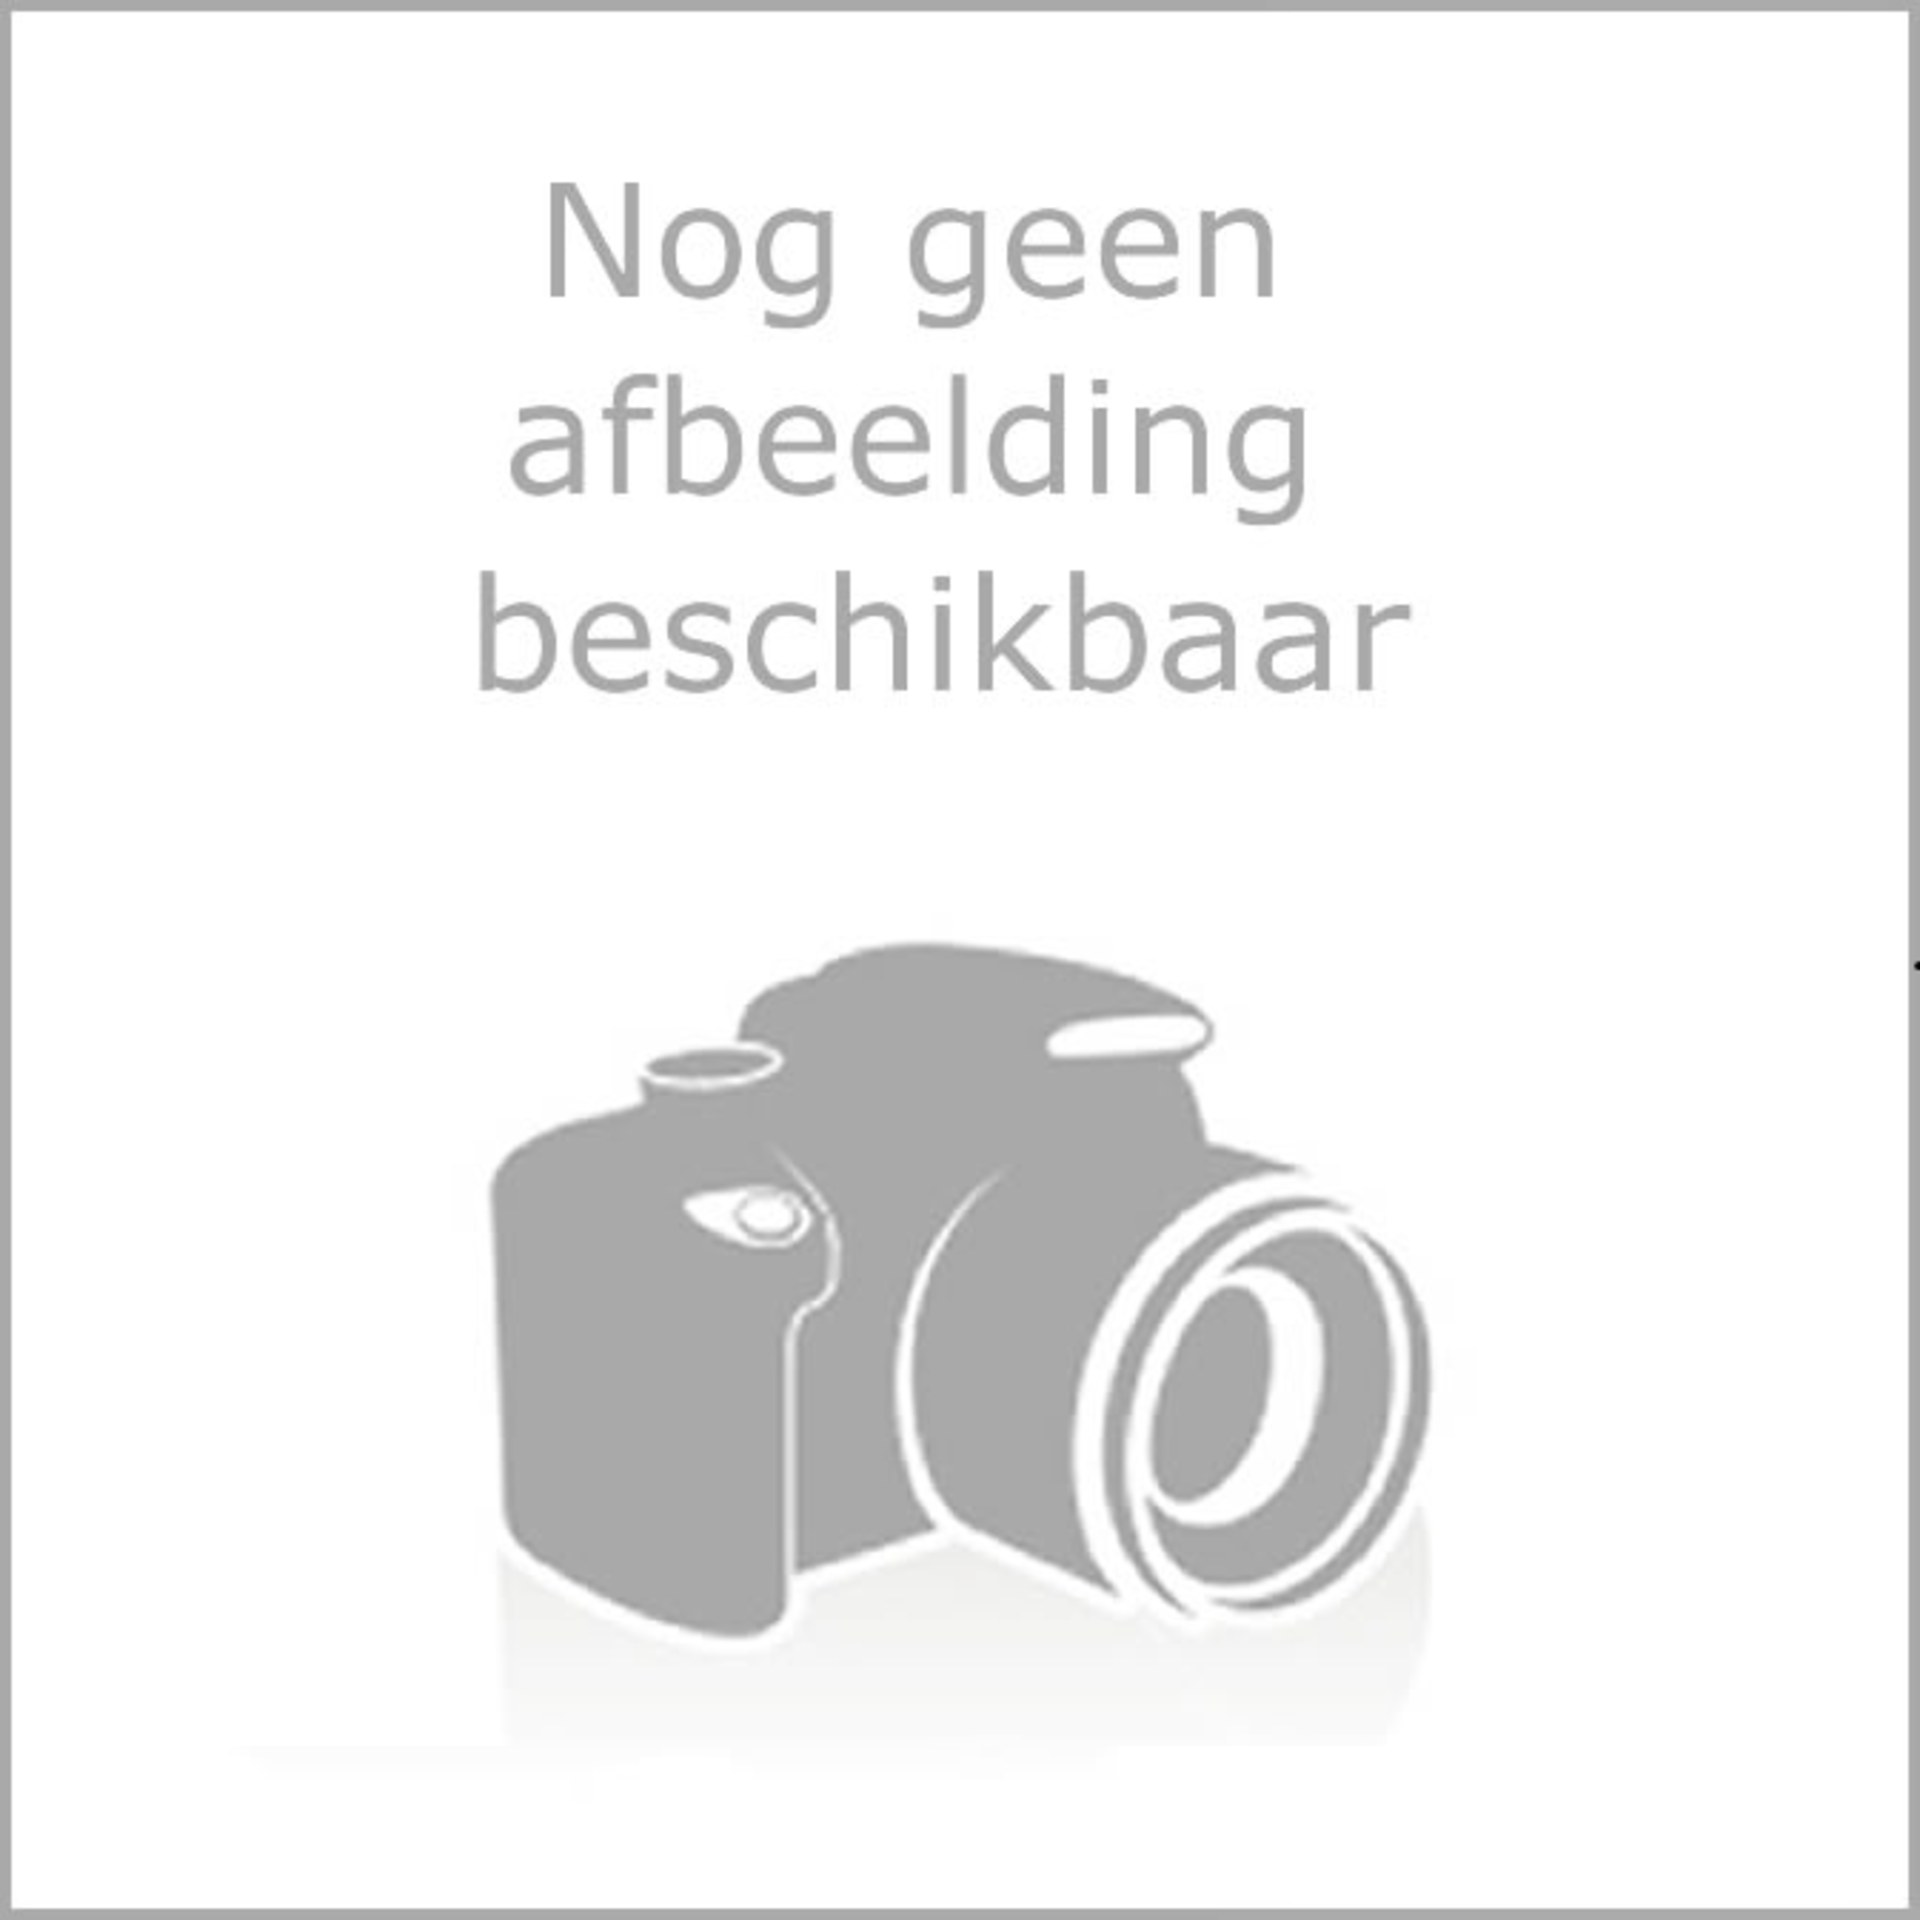 Hoekbank Van Stof.Topform Hoekbank Made For You In Stof